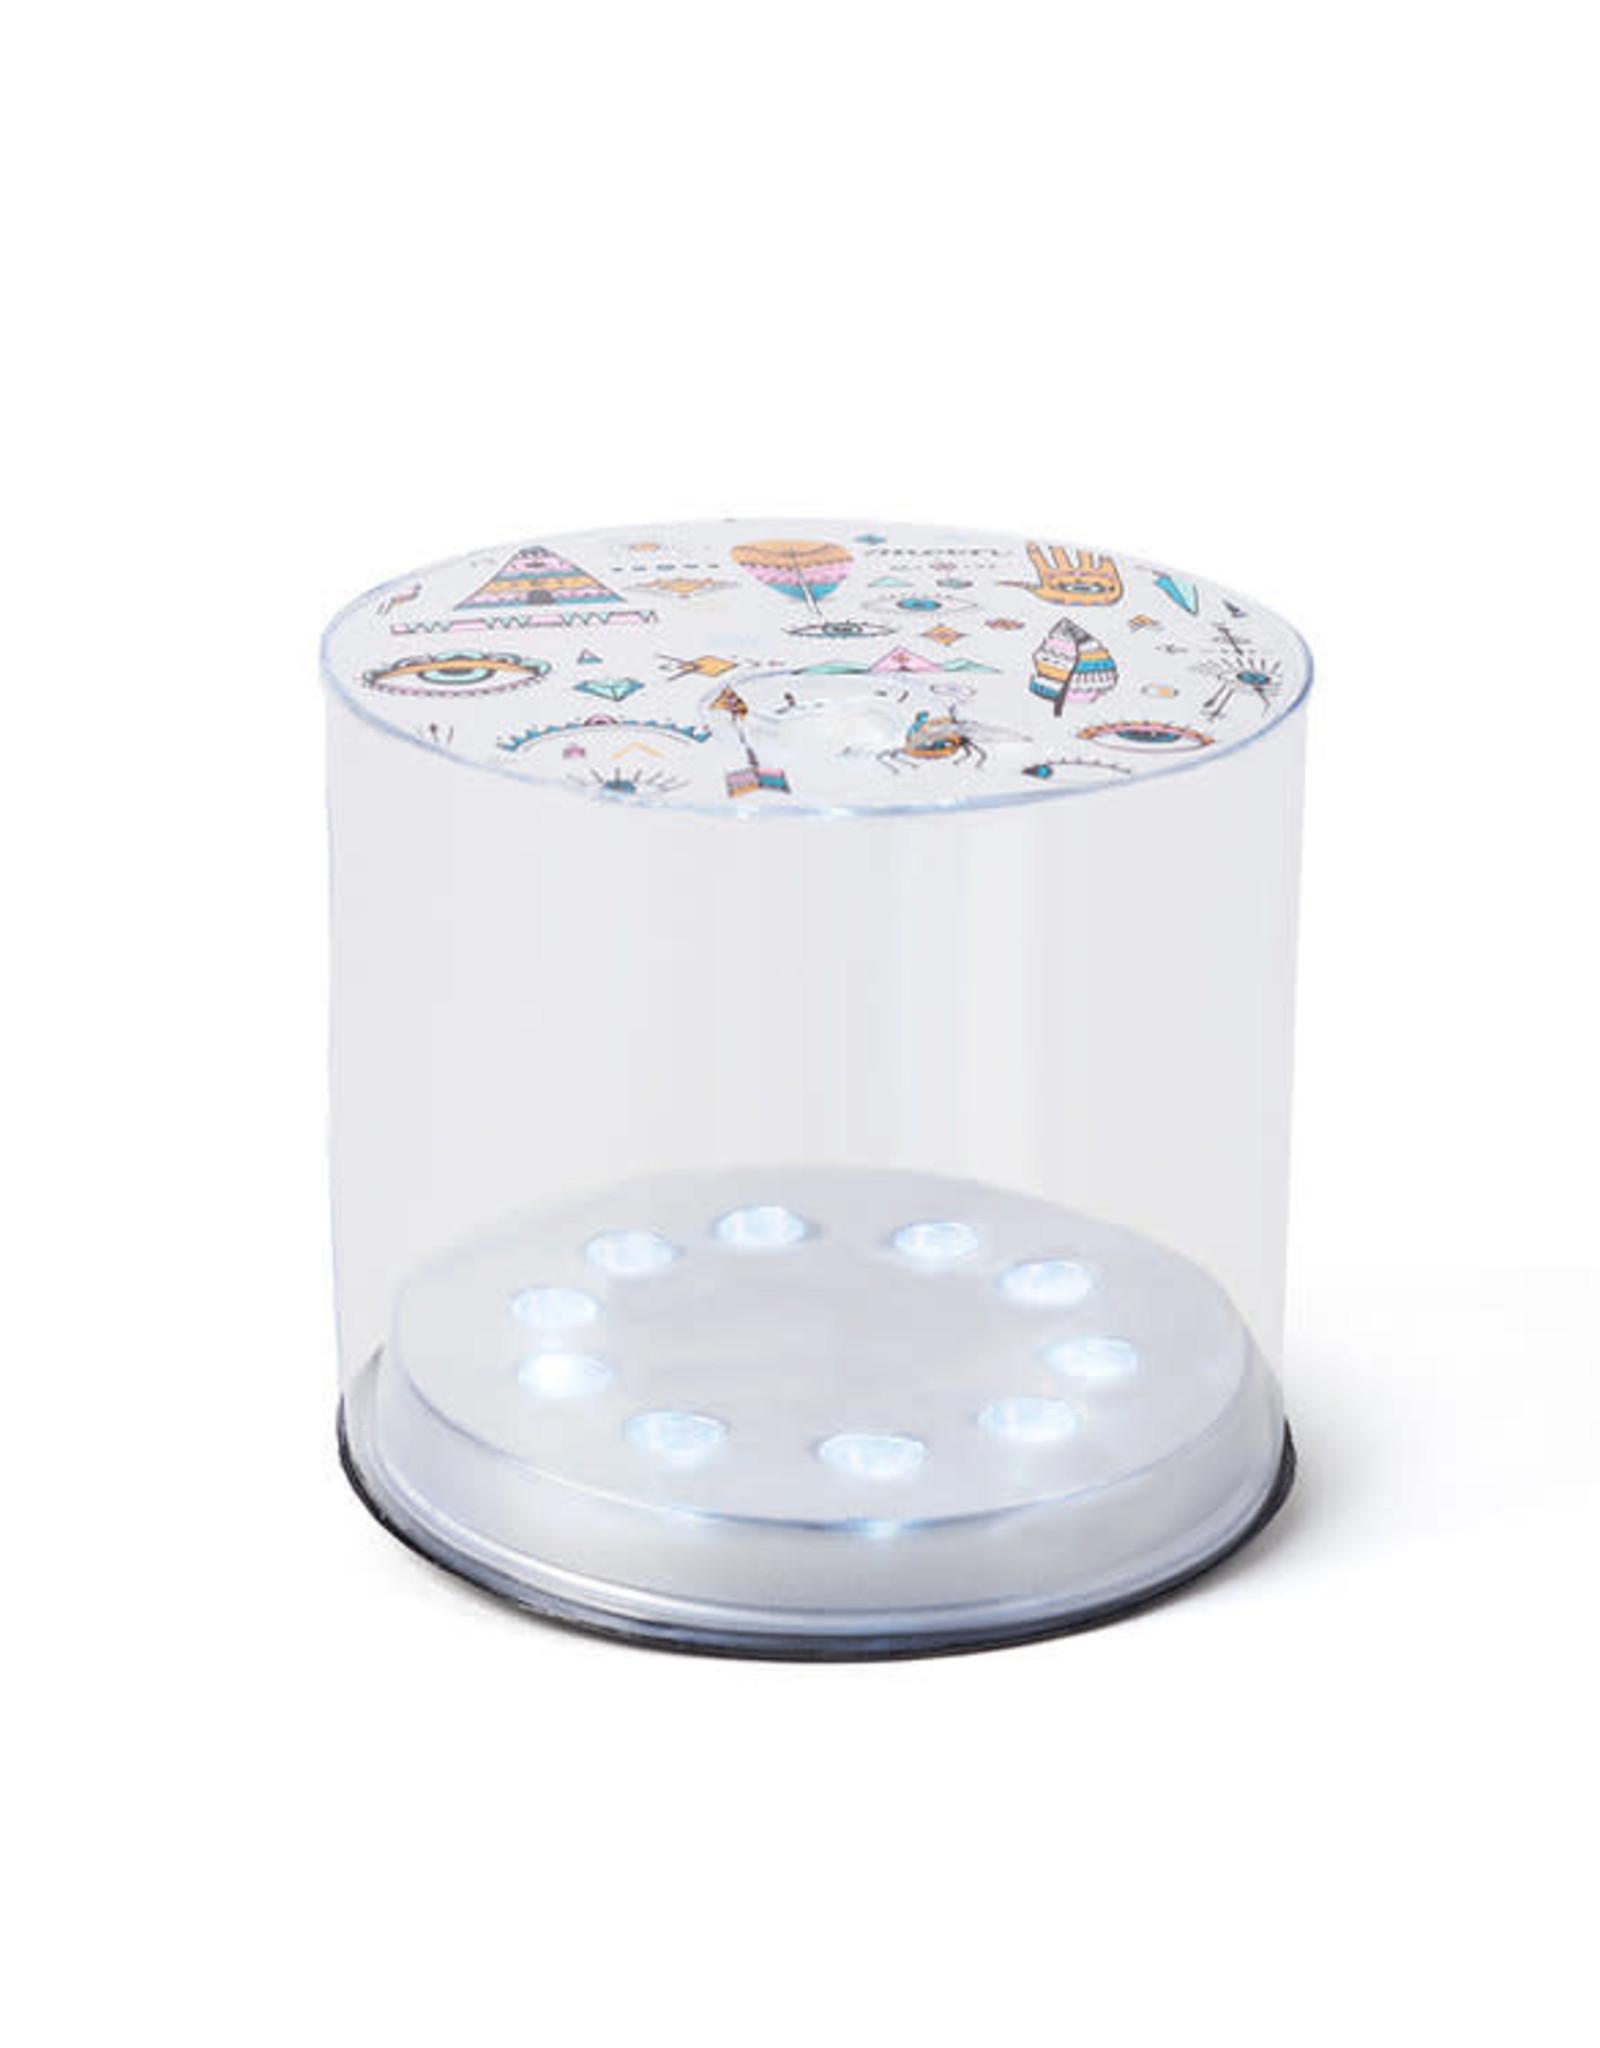 Nod Products Blow & Glow Lantern